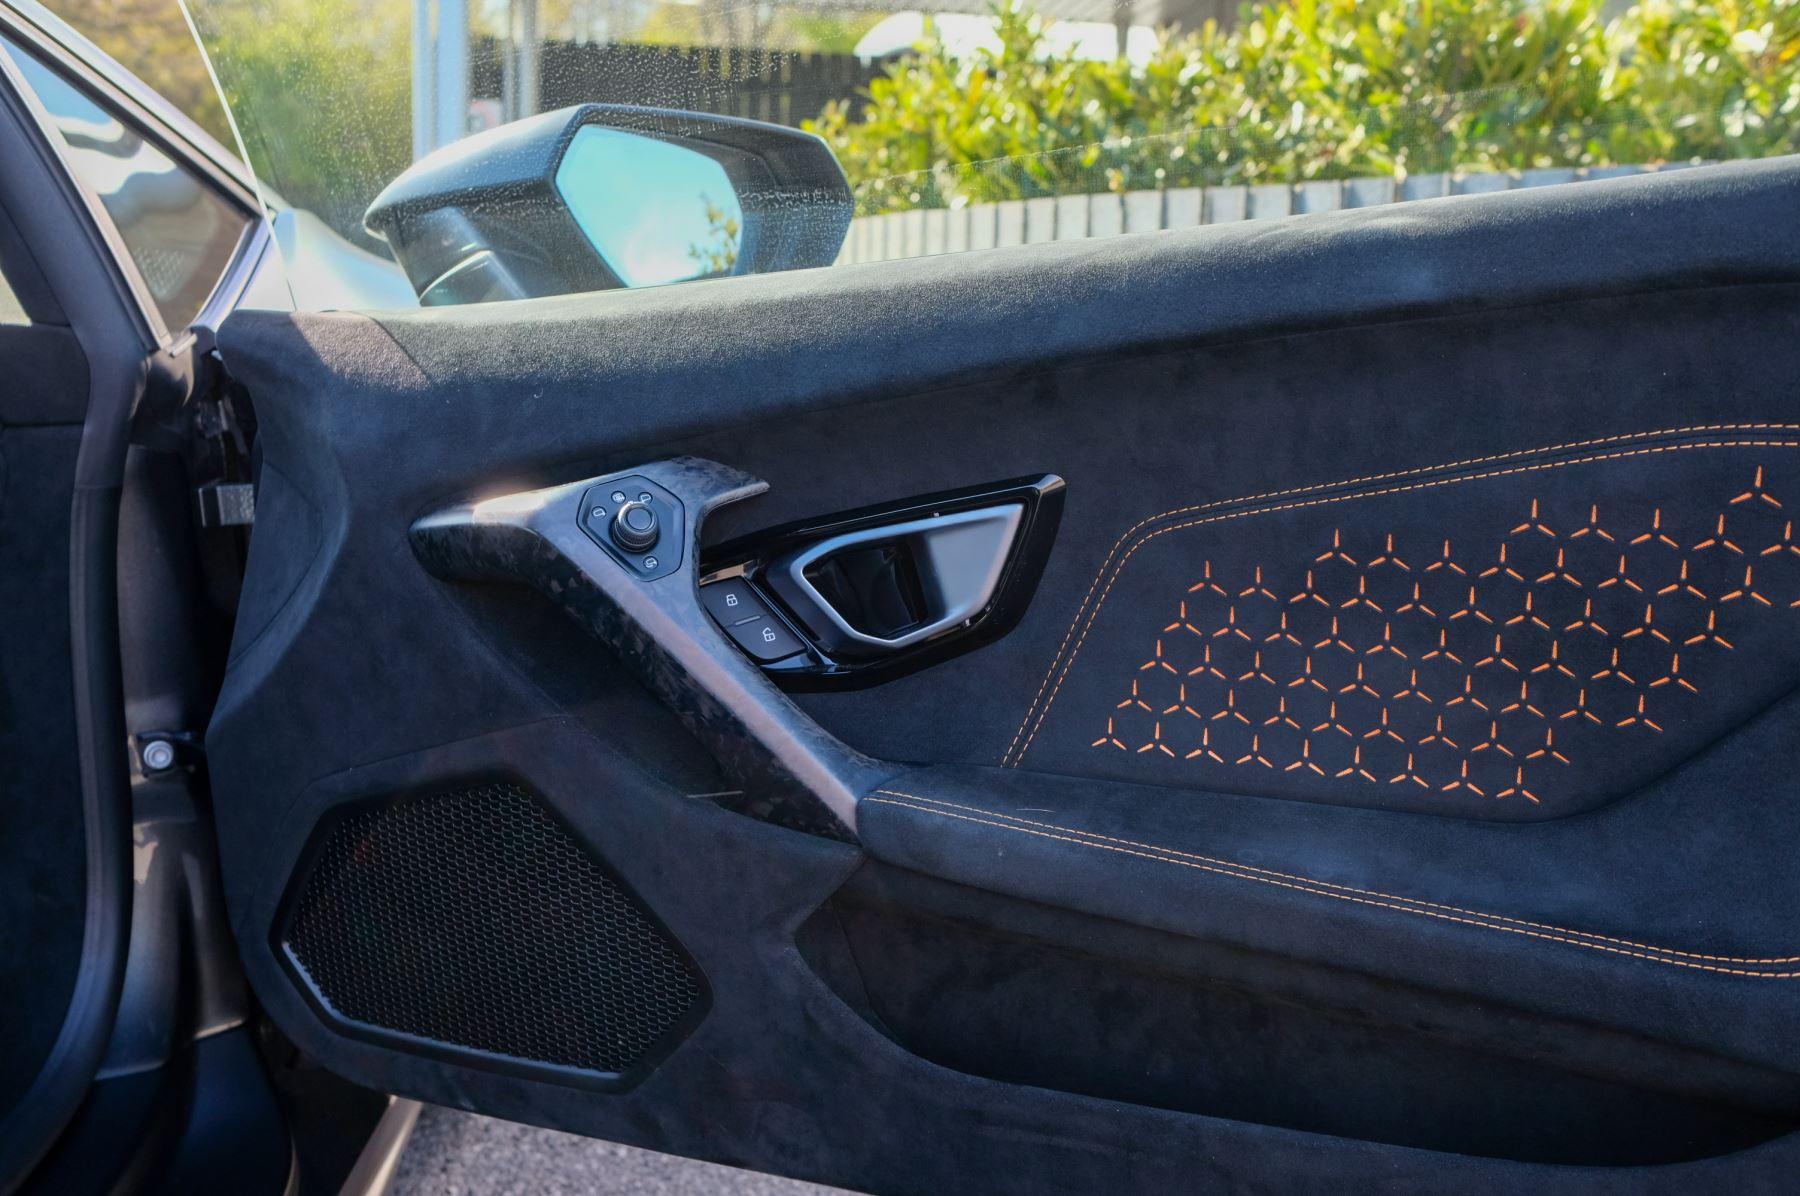 Lamborghini Huracan Performante LP 640-4 2dr LDF - Carbon Ceramic Brakes - Carbon Fiber Features - Comfort Seats image 13